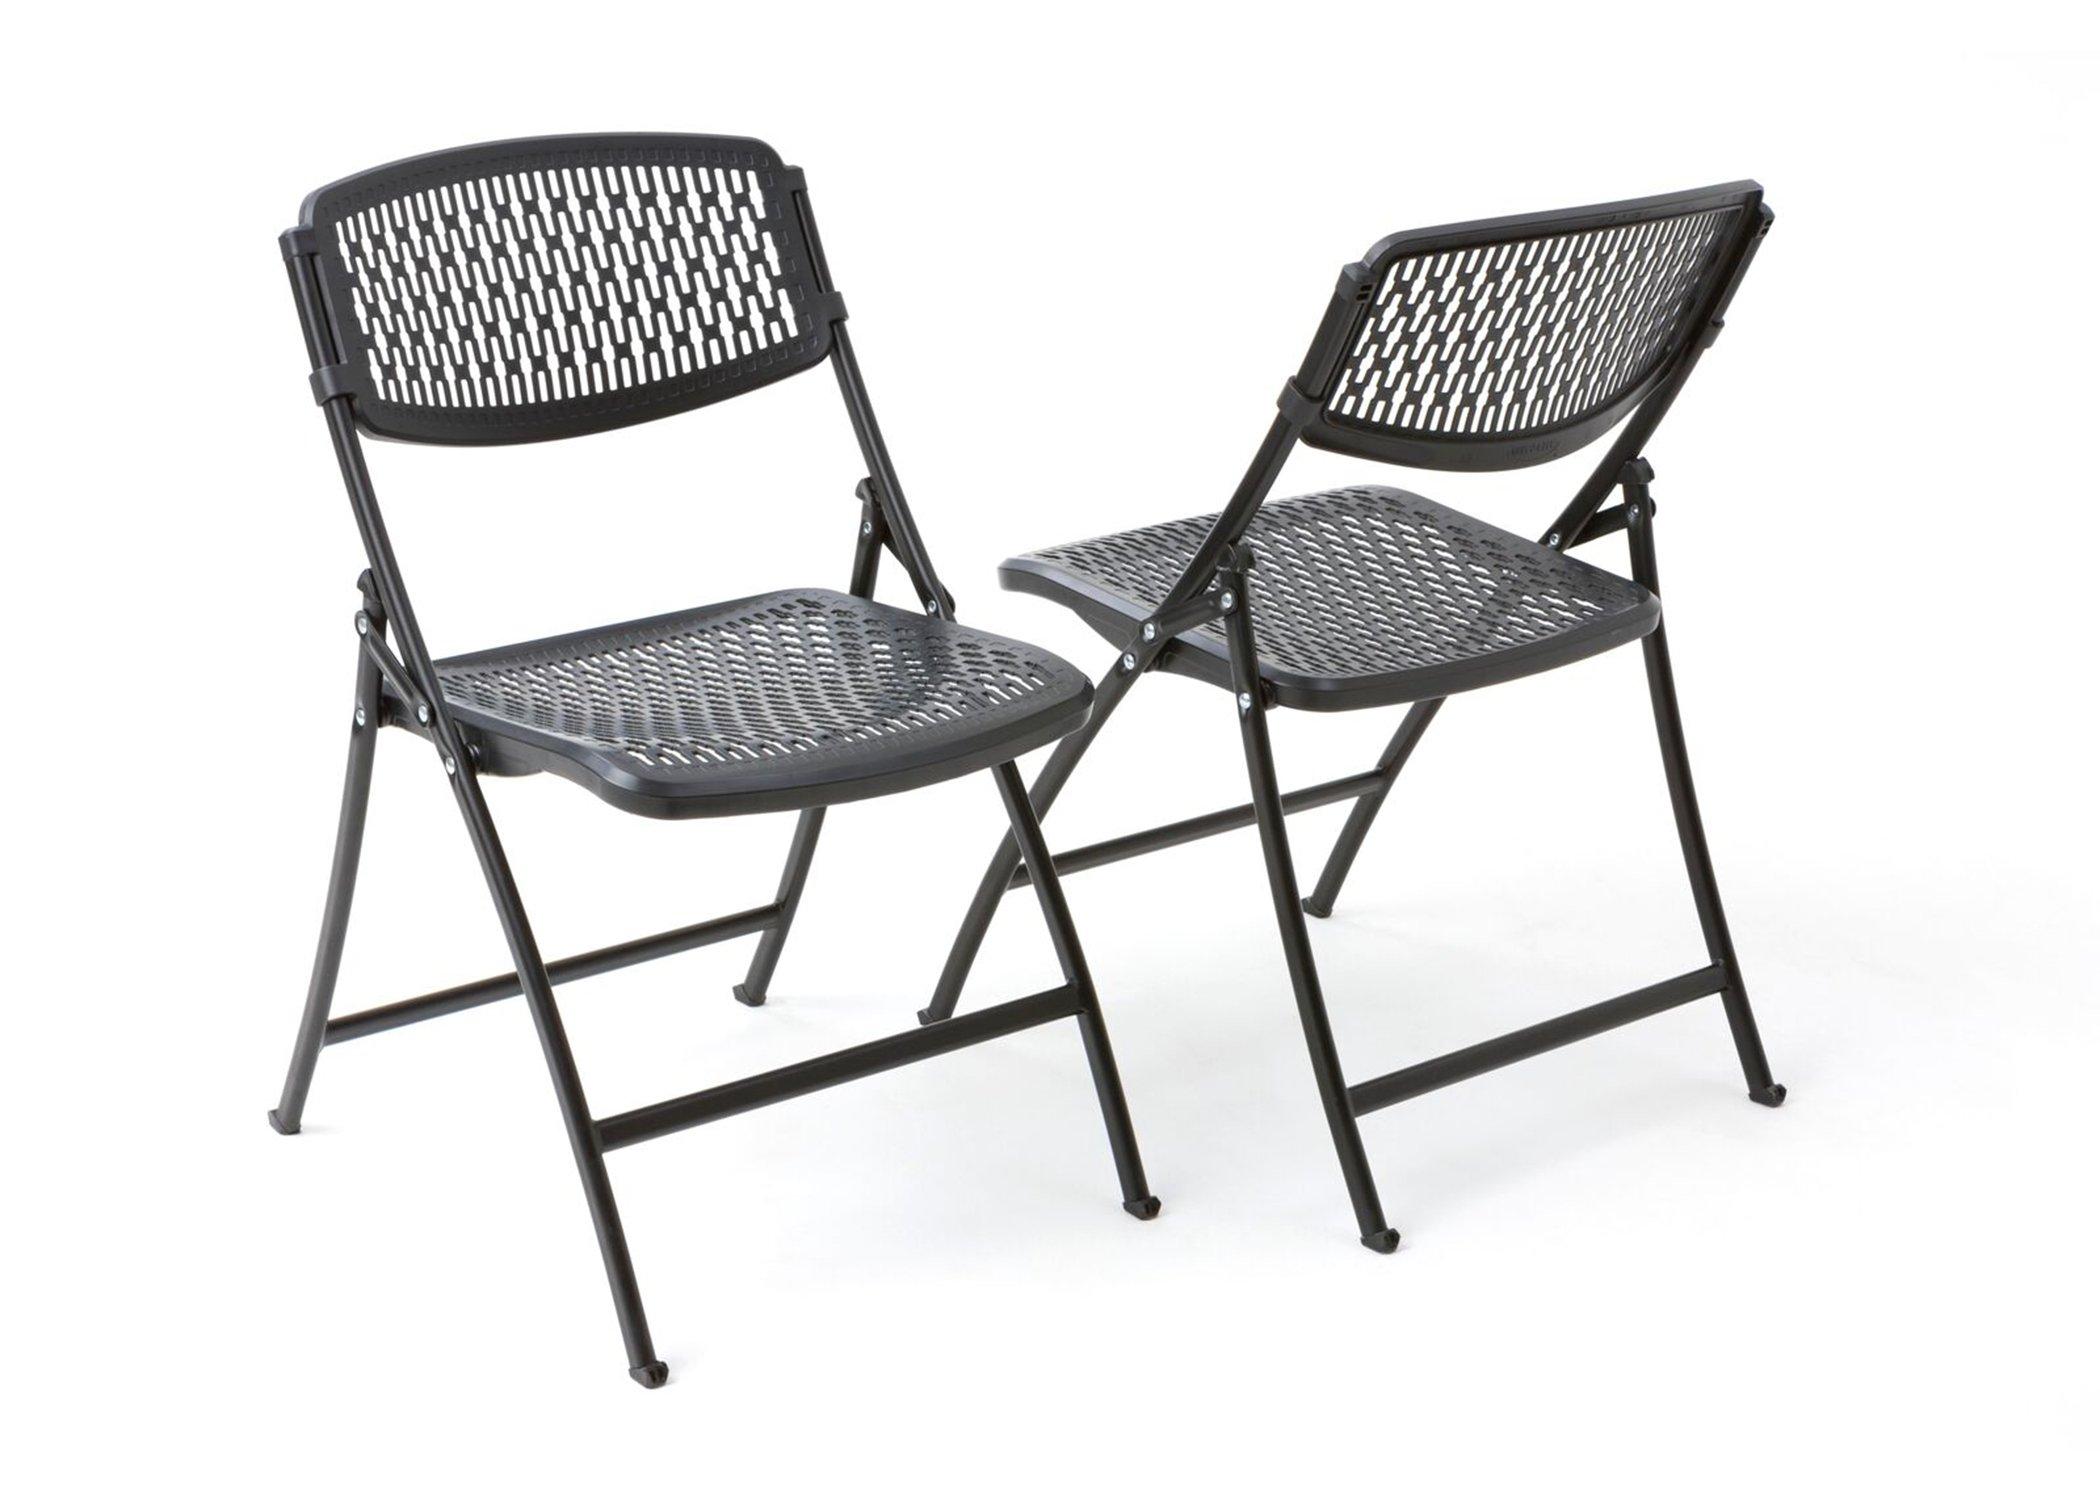 Flex e Folding Chair Black 4 Pack